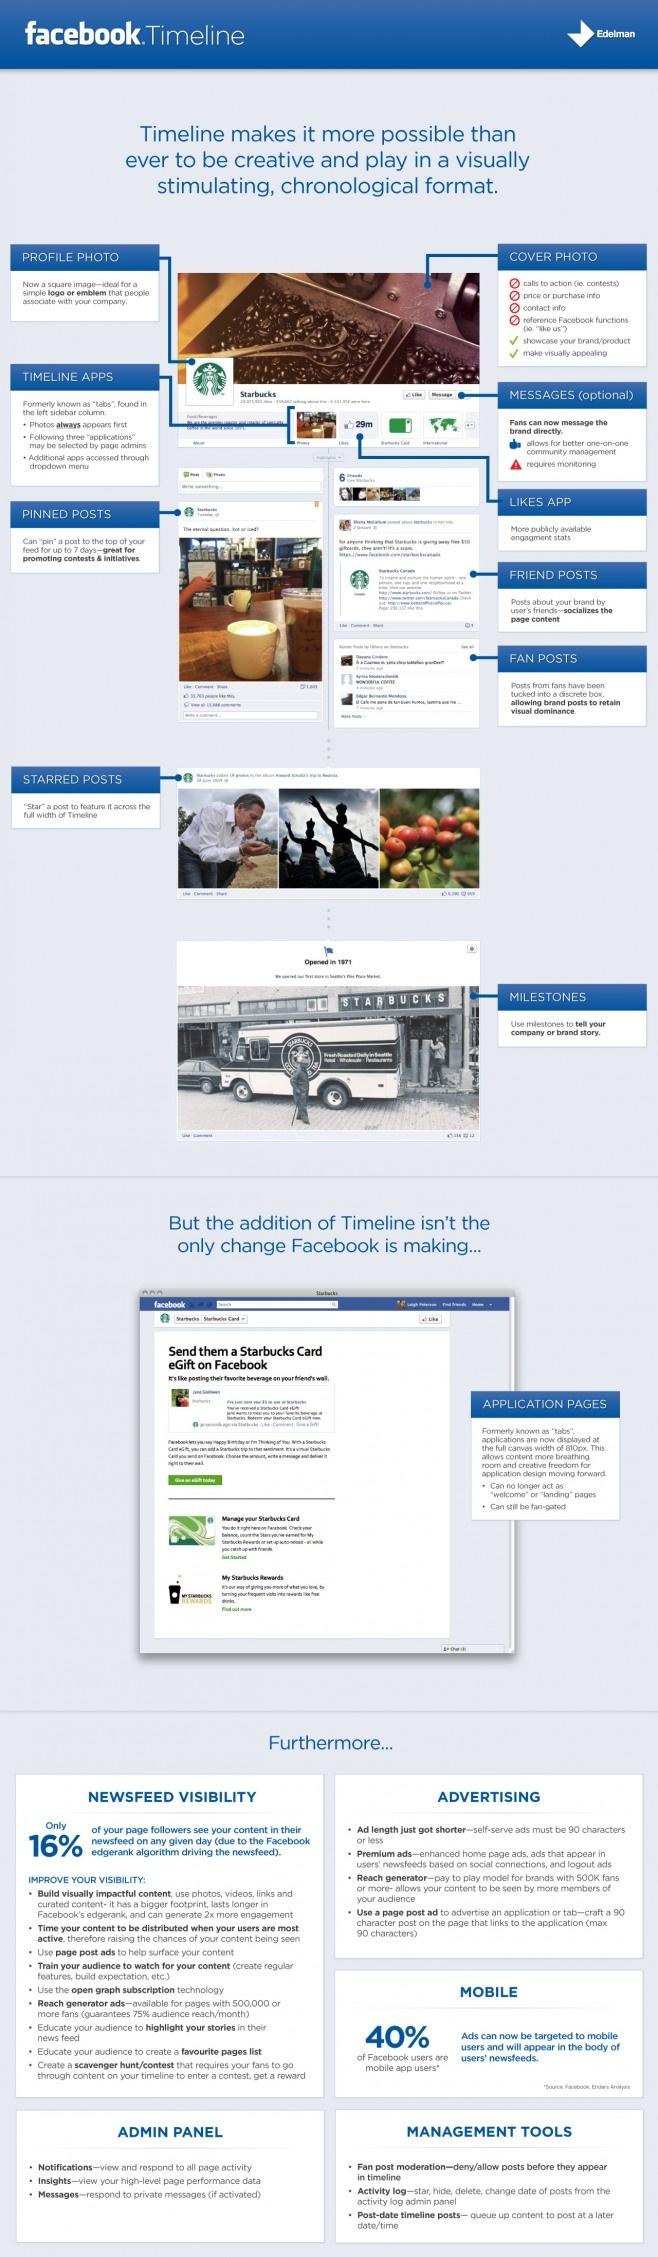 The new Facebook timeline: Timeline Infographic, Infographic Socialmedia, Website, Social Media, Facebook Timeline, Media Infographic, Timeline Overview, Facebook Infographic, Facebook Marketing